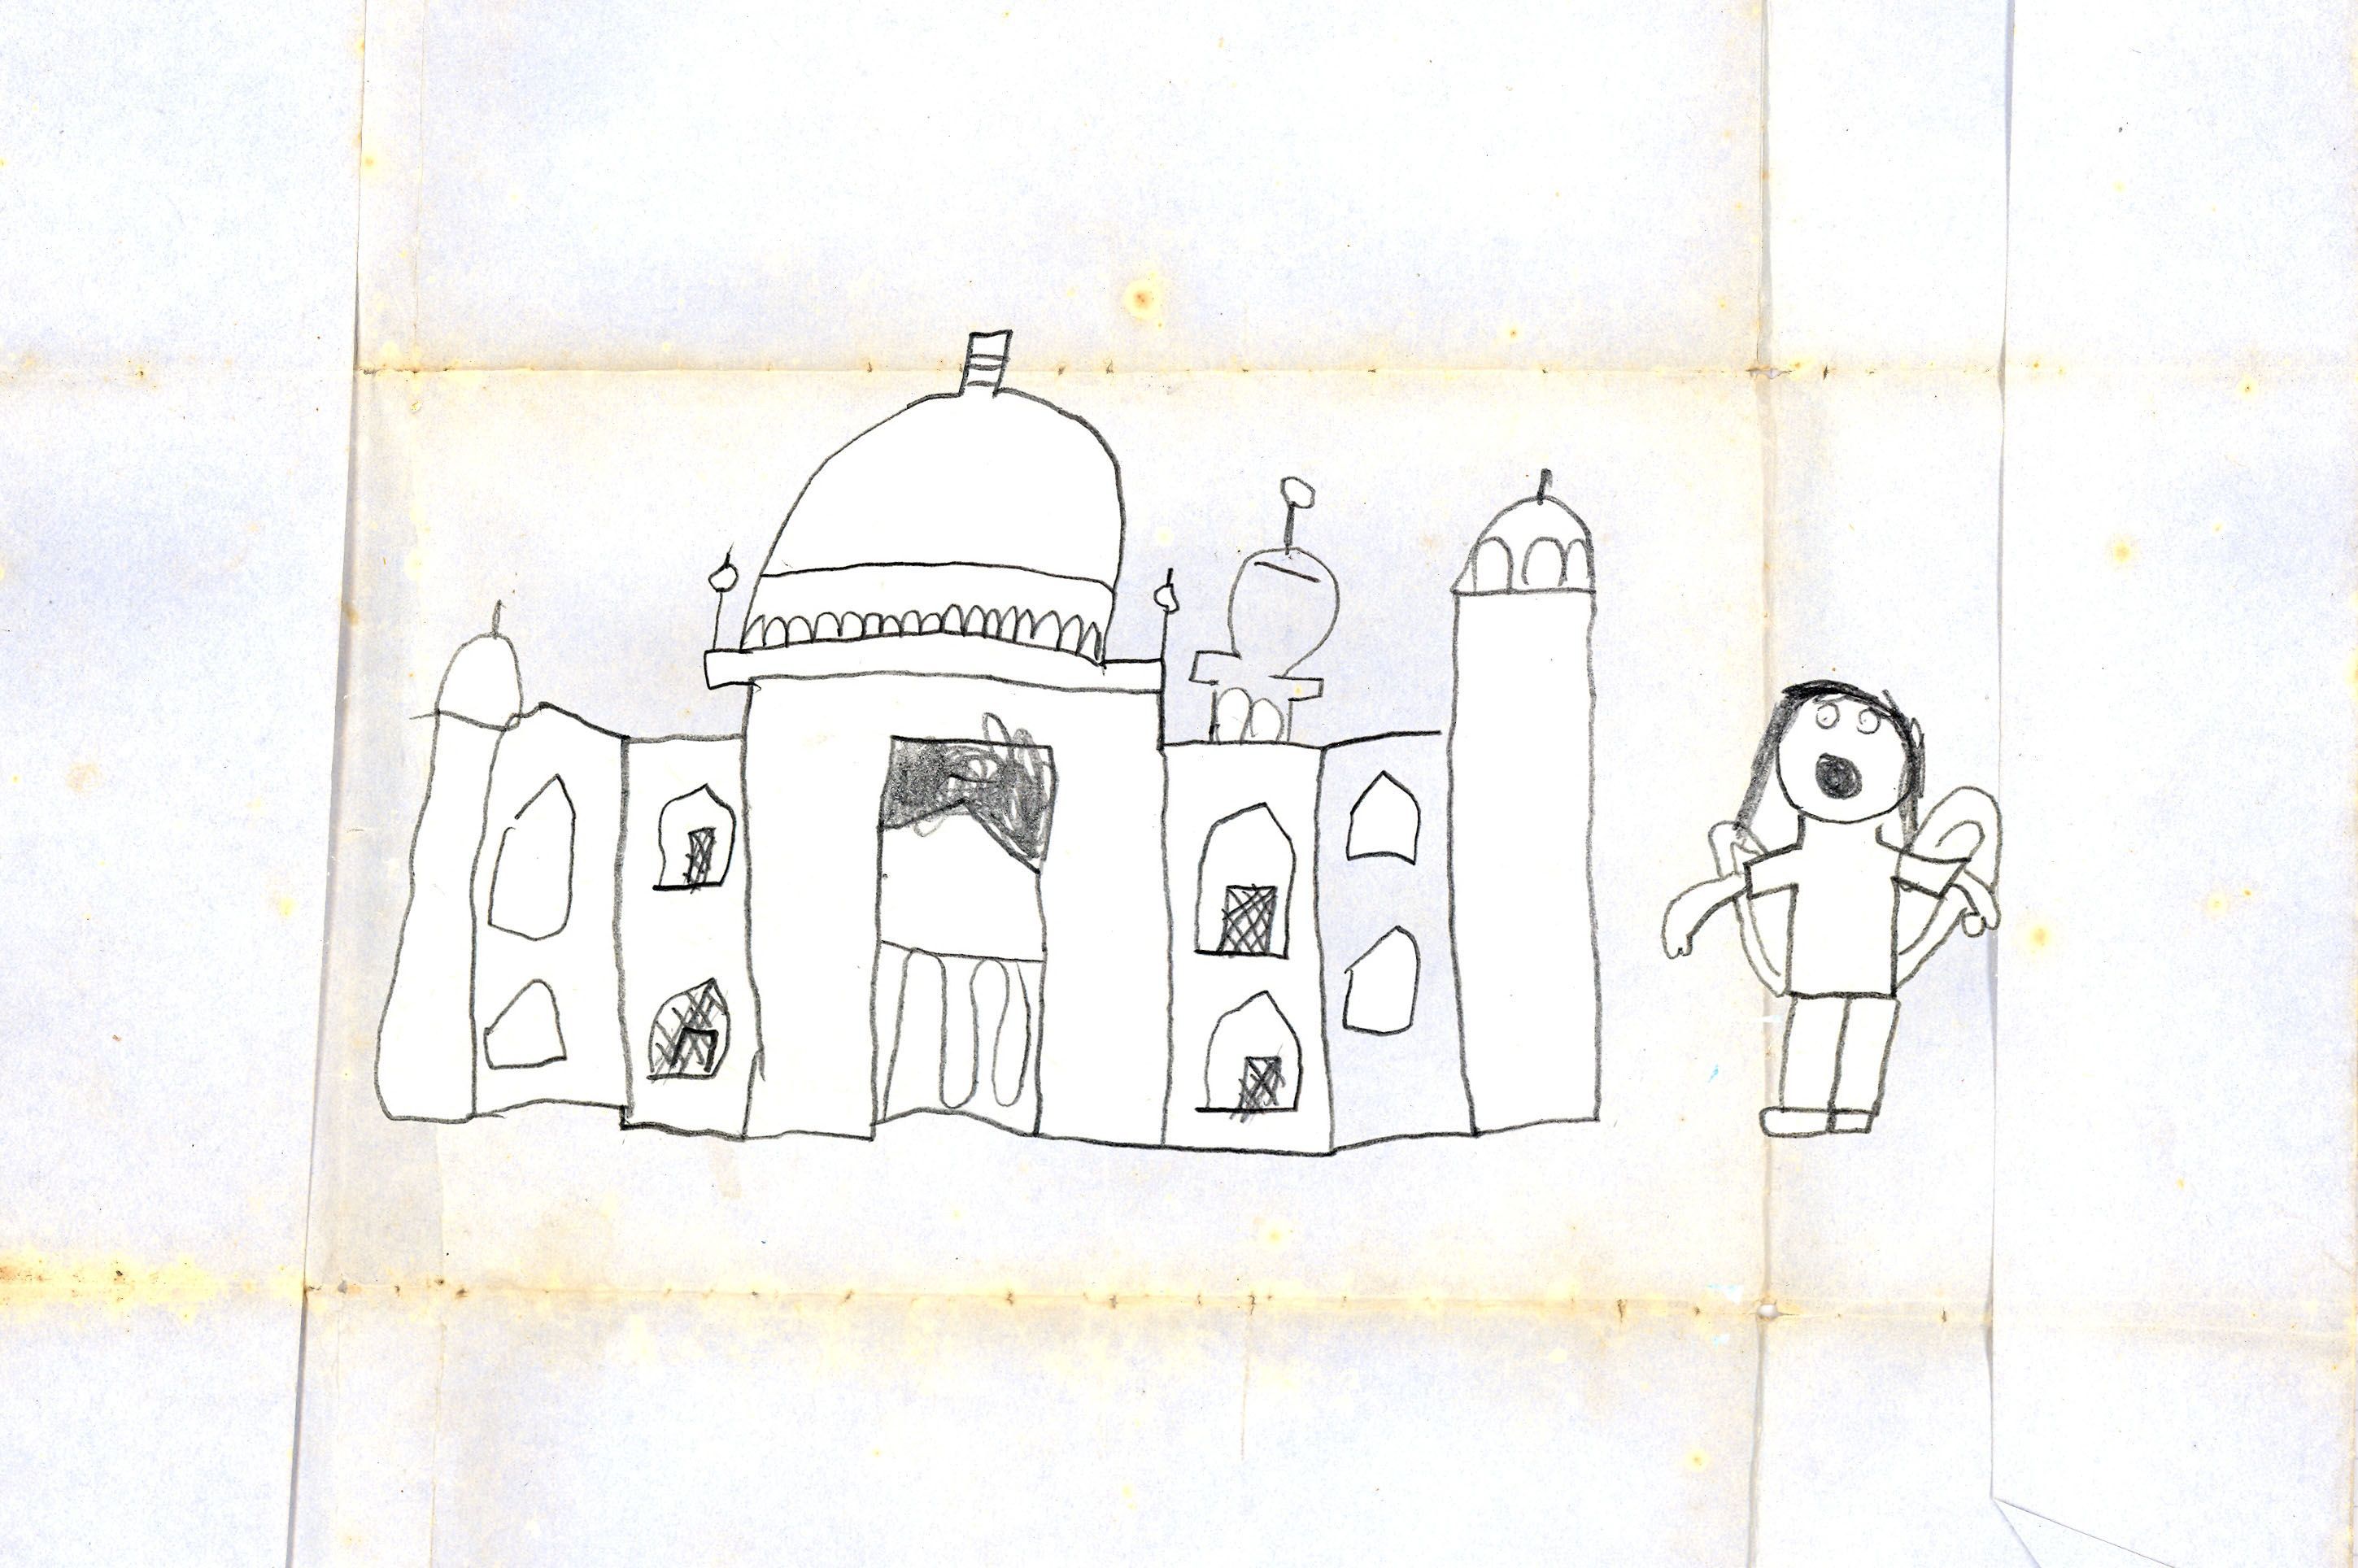 Taj Mahal by Oz aged 7